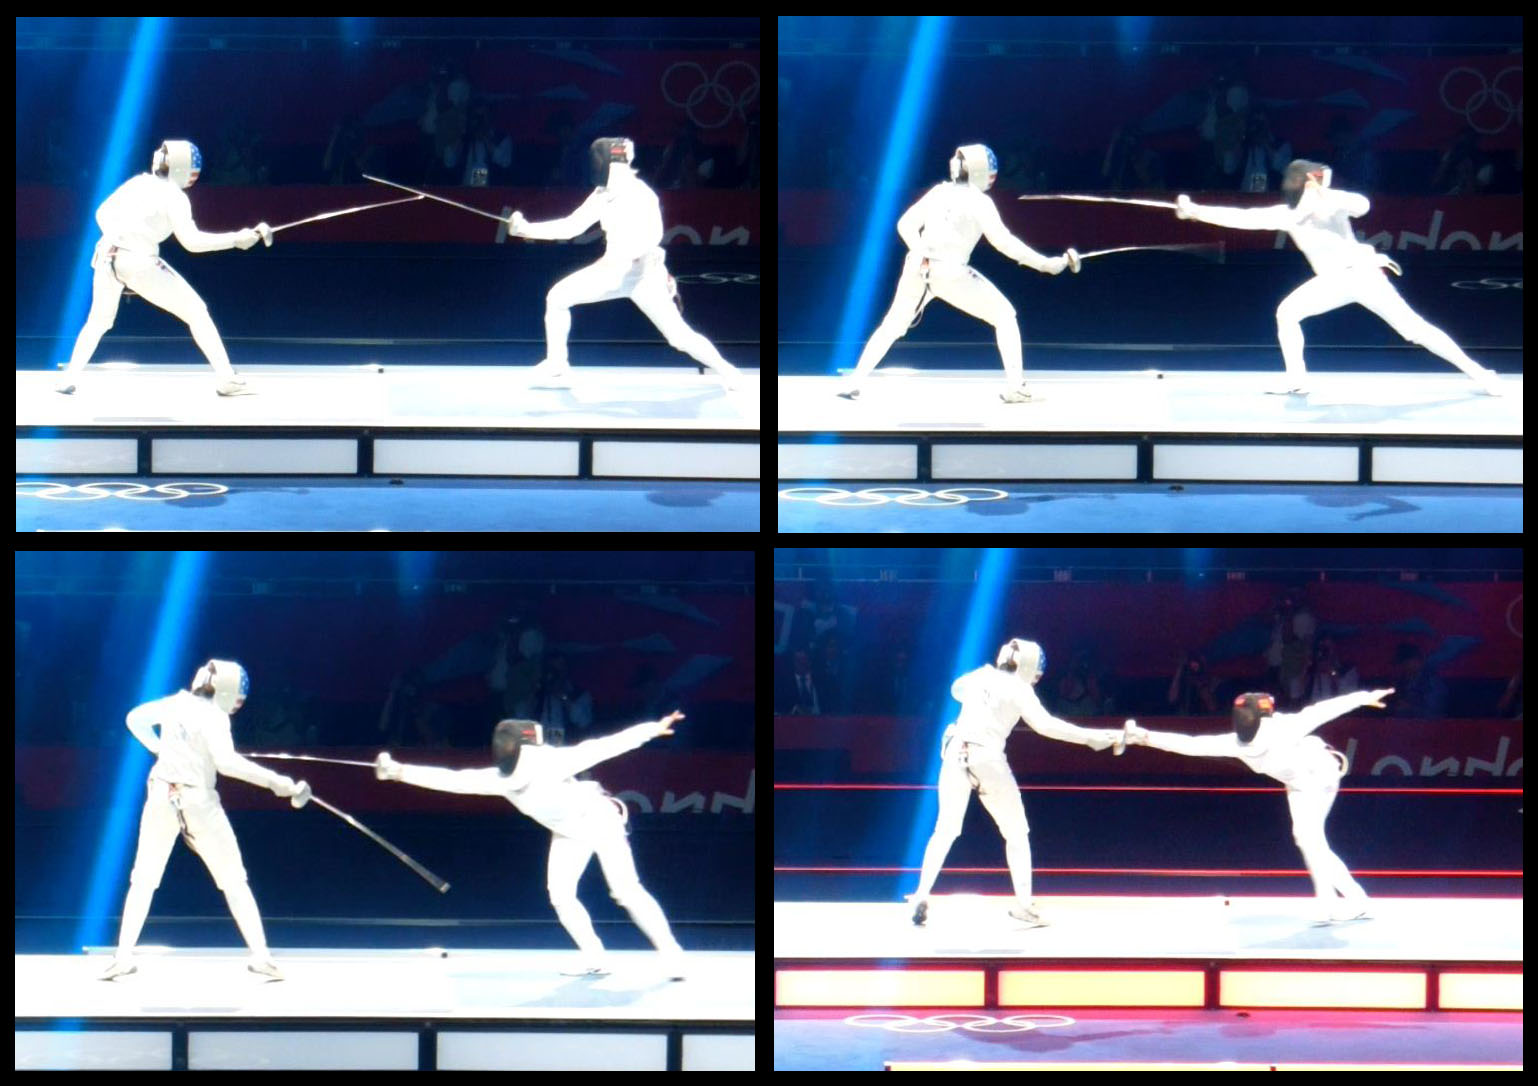 FencingSequence.jpg